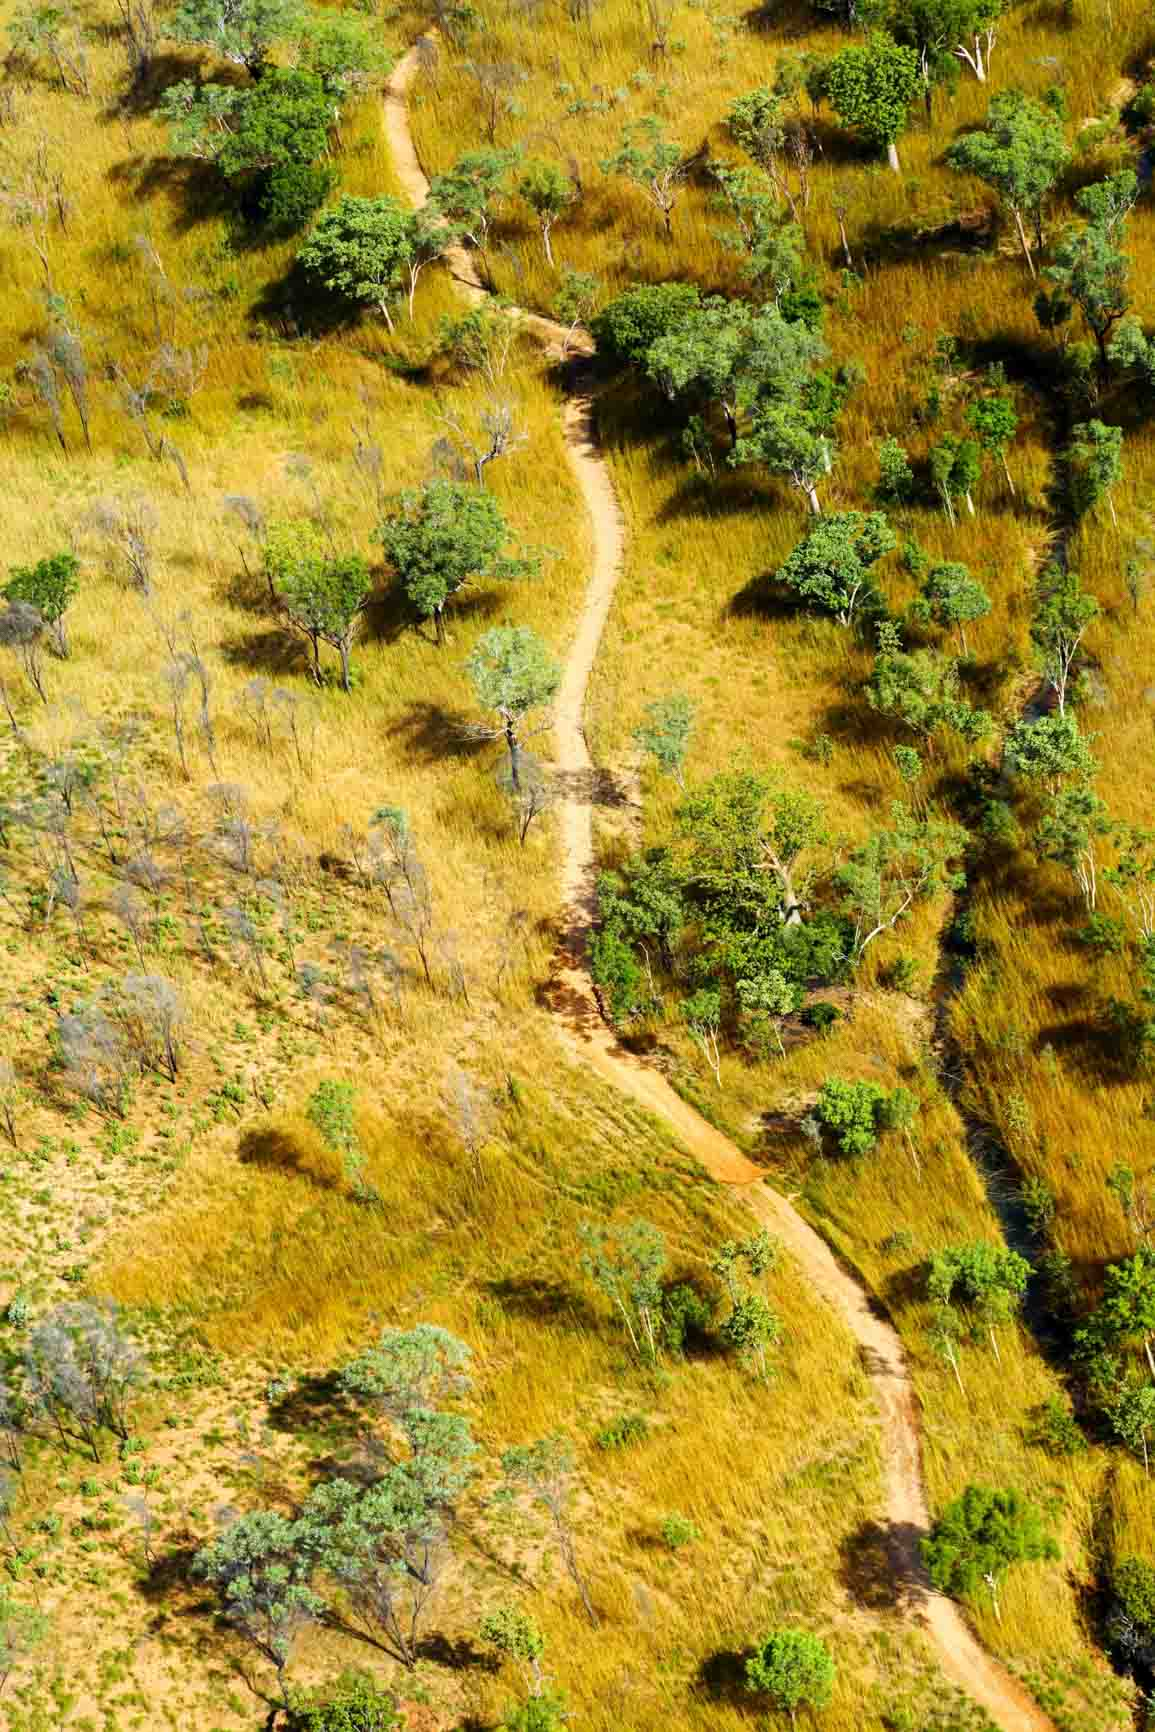 Winding dirt path shot from above through Western Australian bush